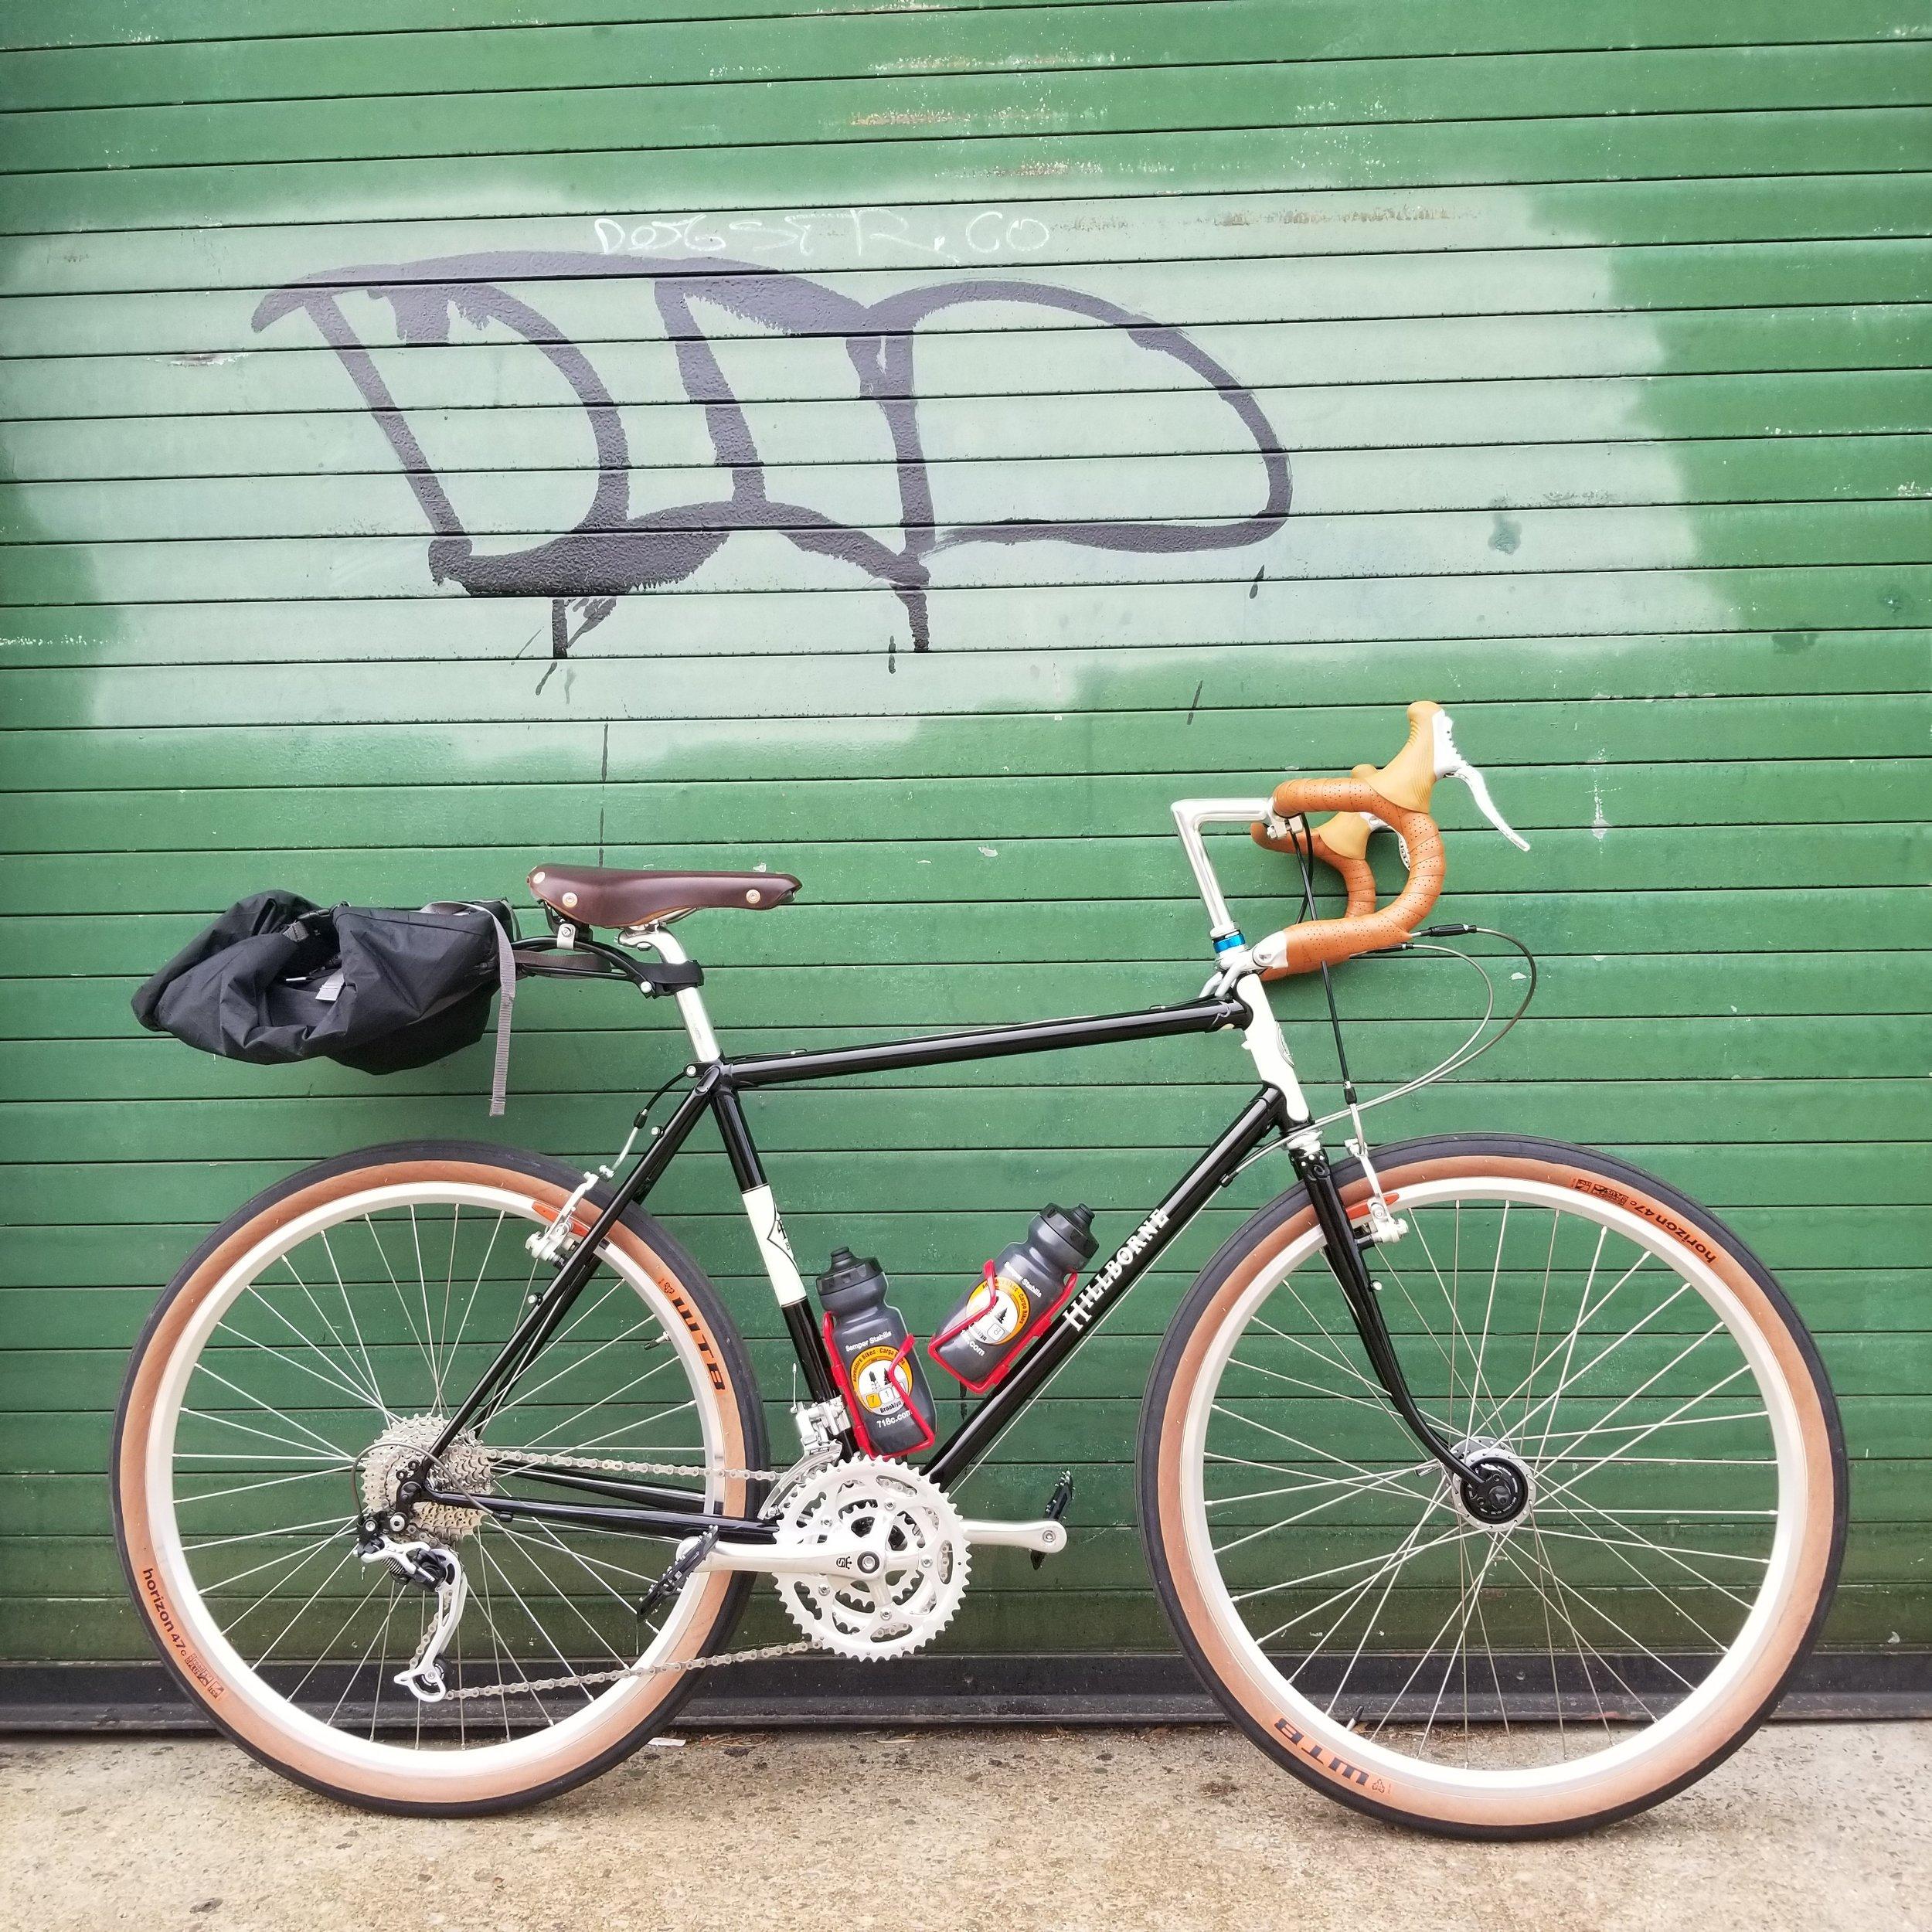 718 Cyclery - Touring Bikes